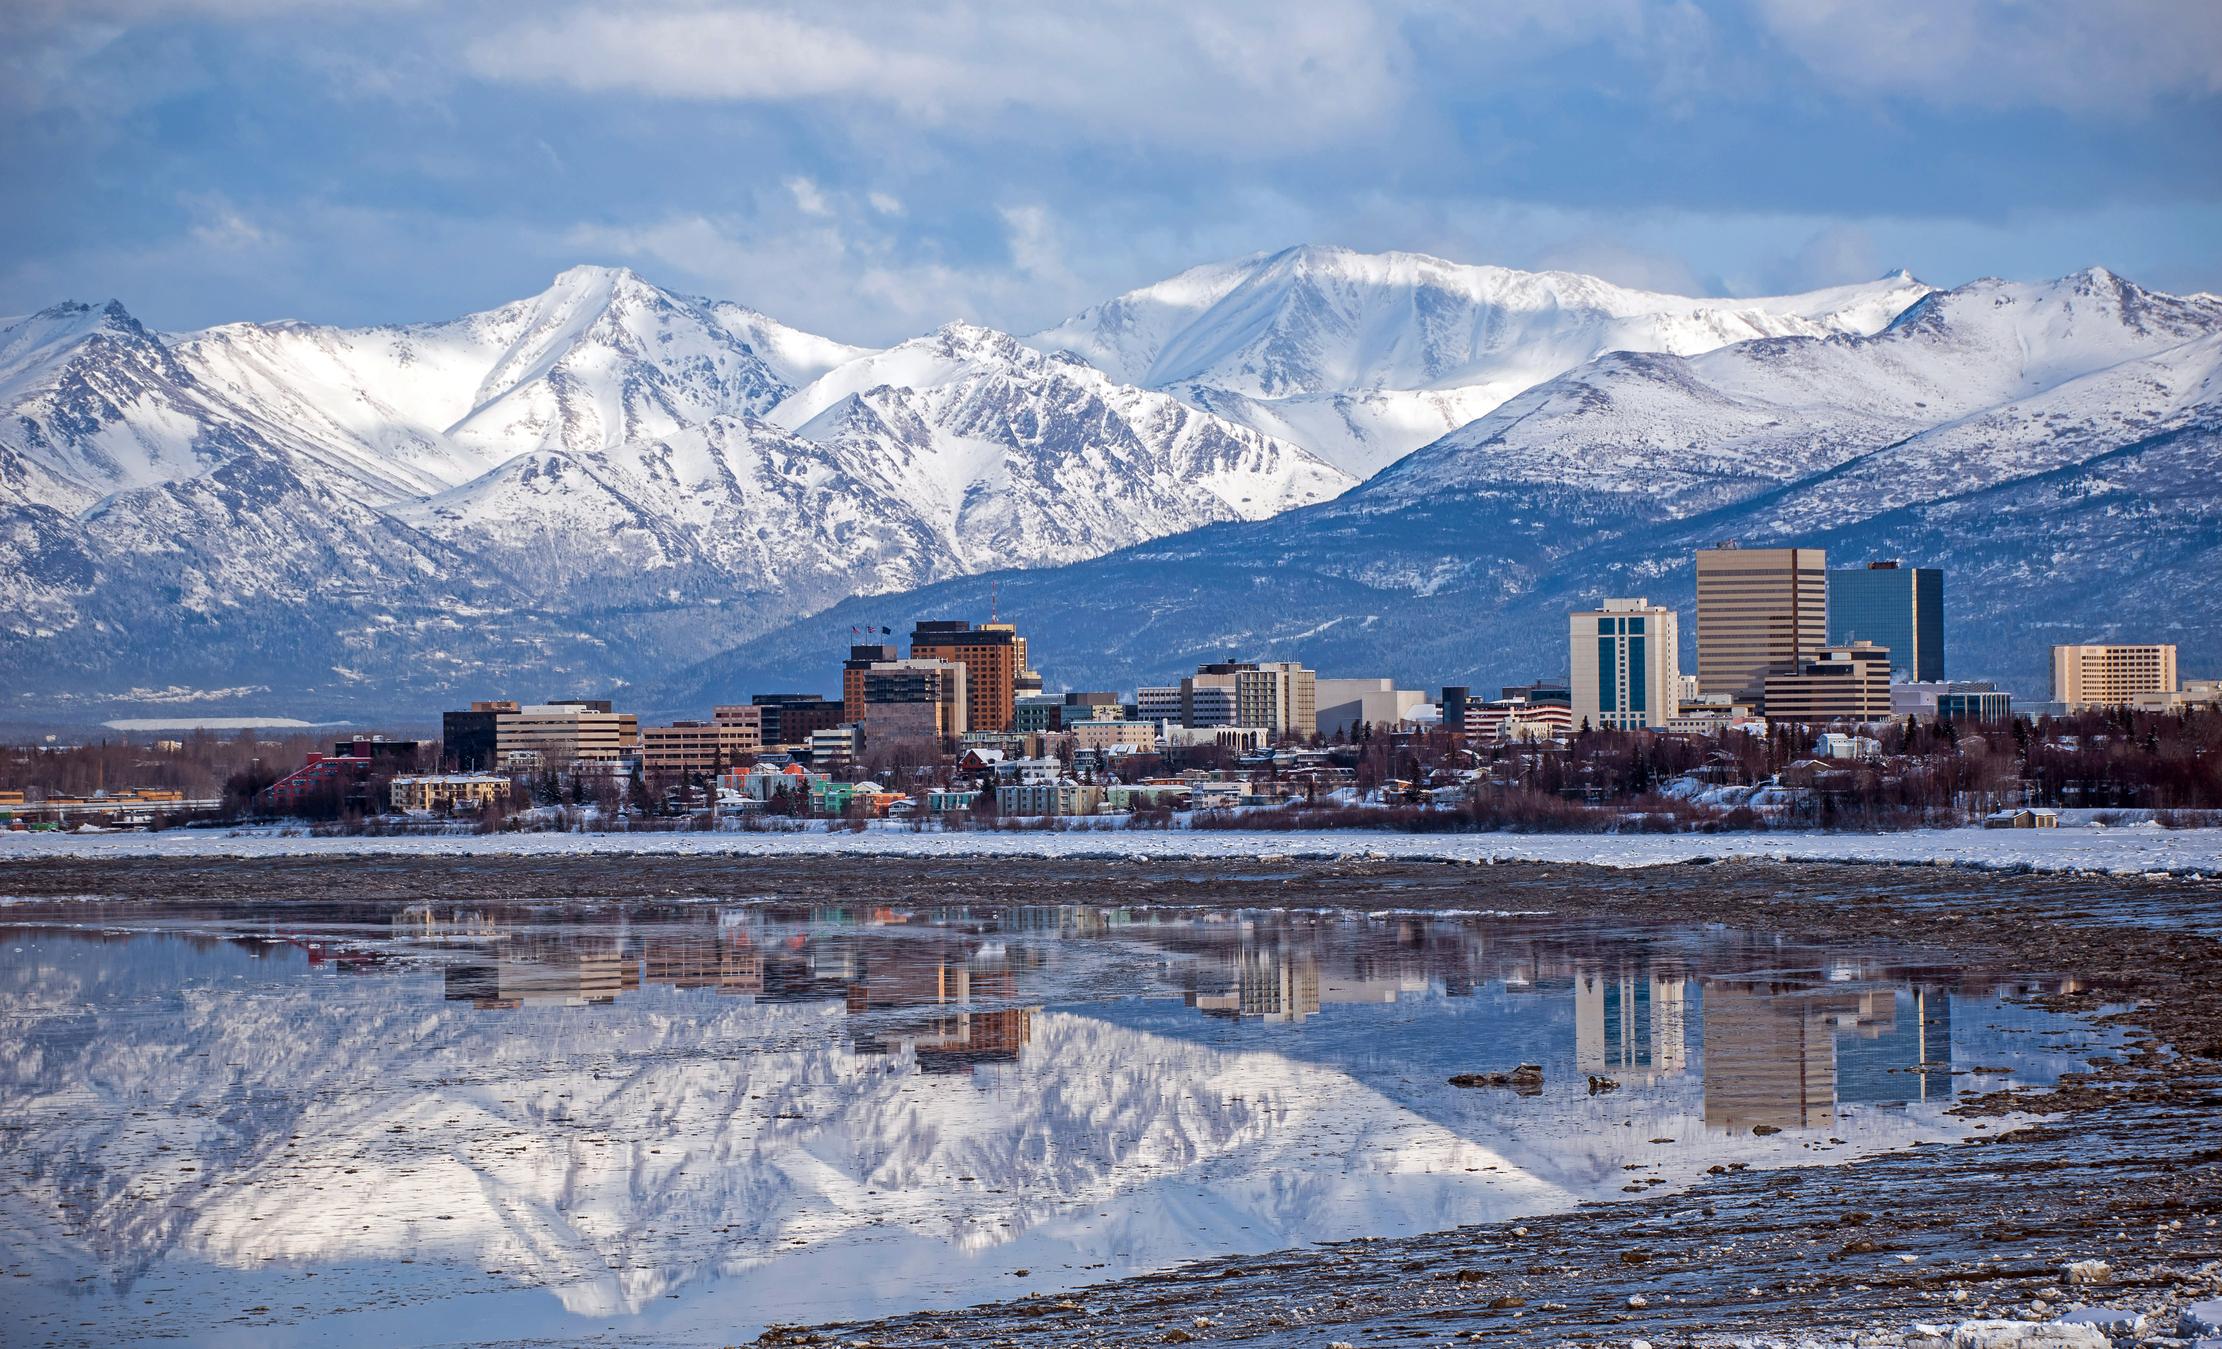 GCI Liberty Grows Consumer Data Revenue in Tough Alaskan Economy